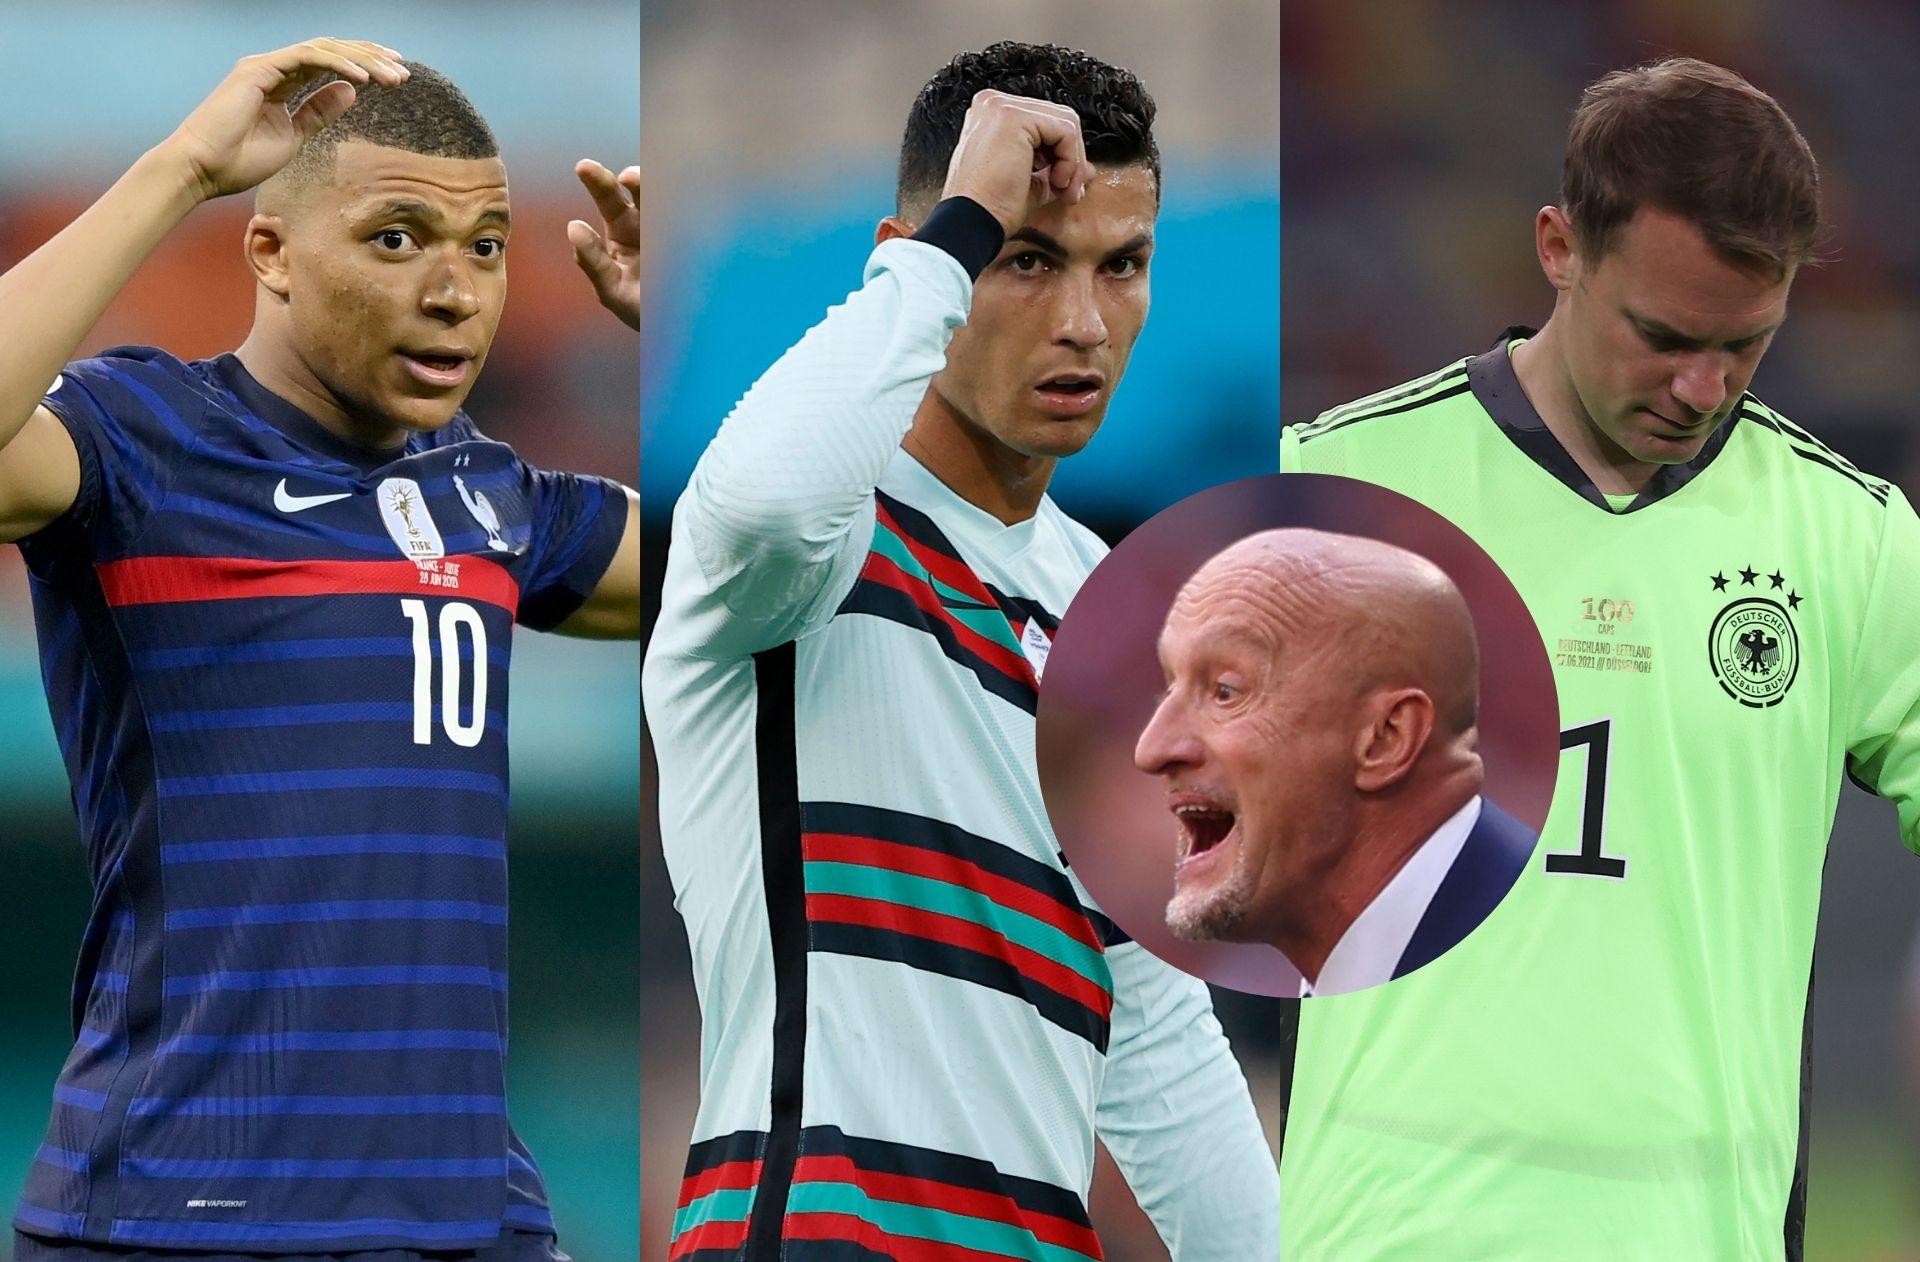 Mbappe, Ronaldo, Neuer, Rossi